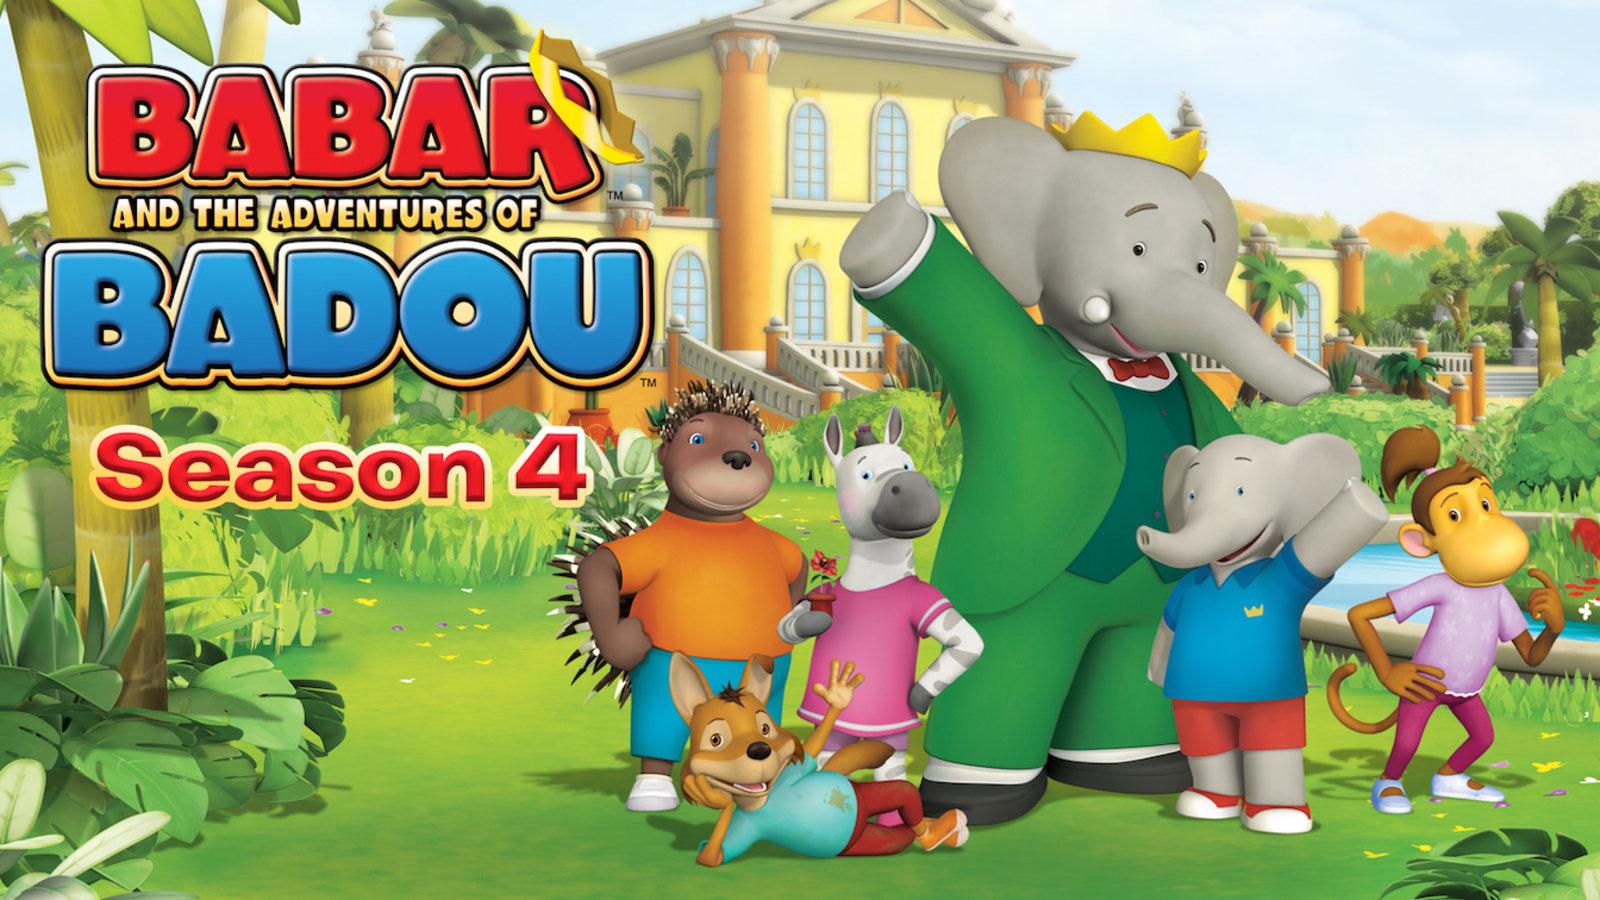 Babar and the Adventures of Badou Season 4